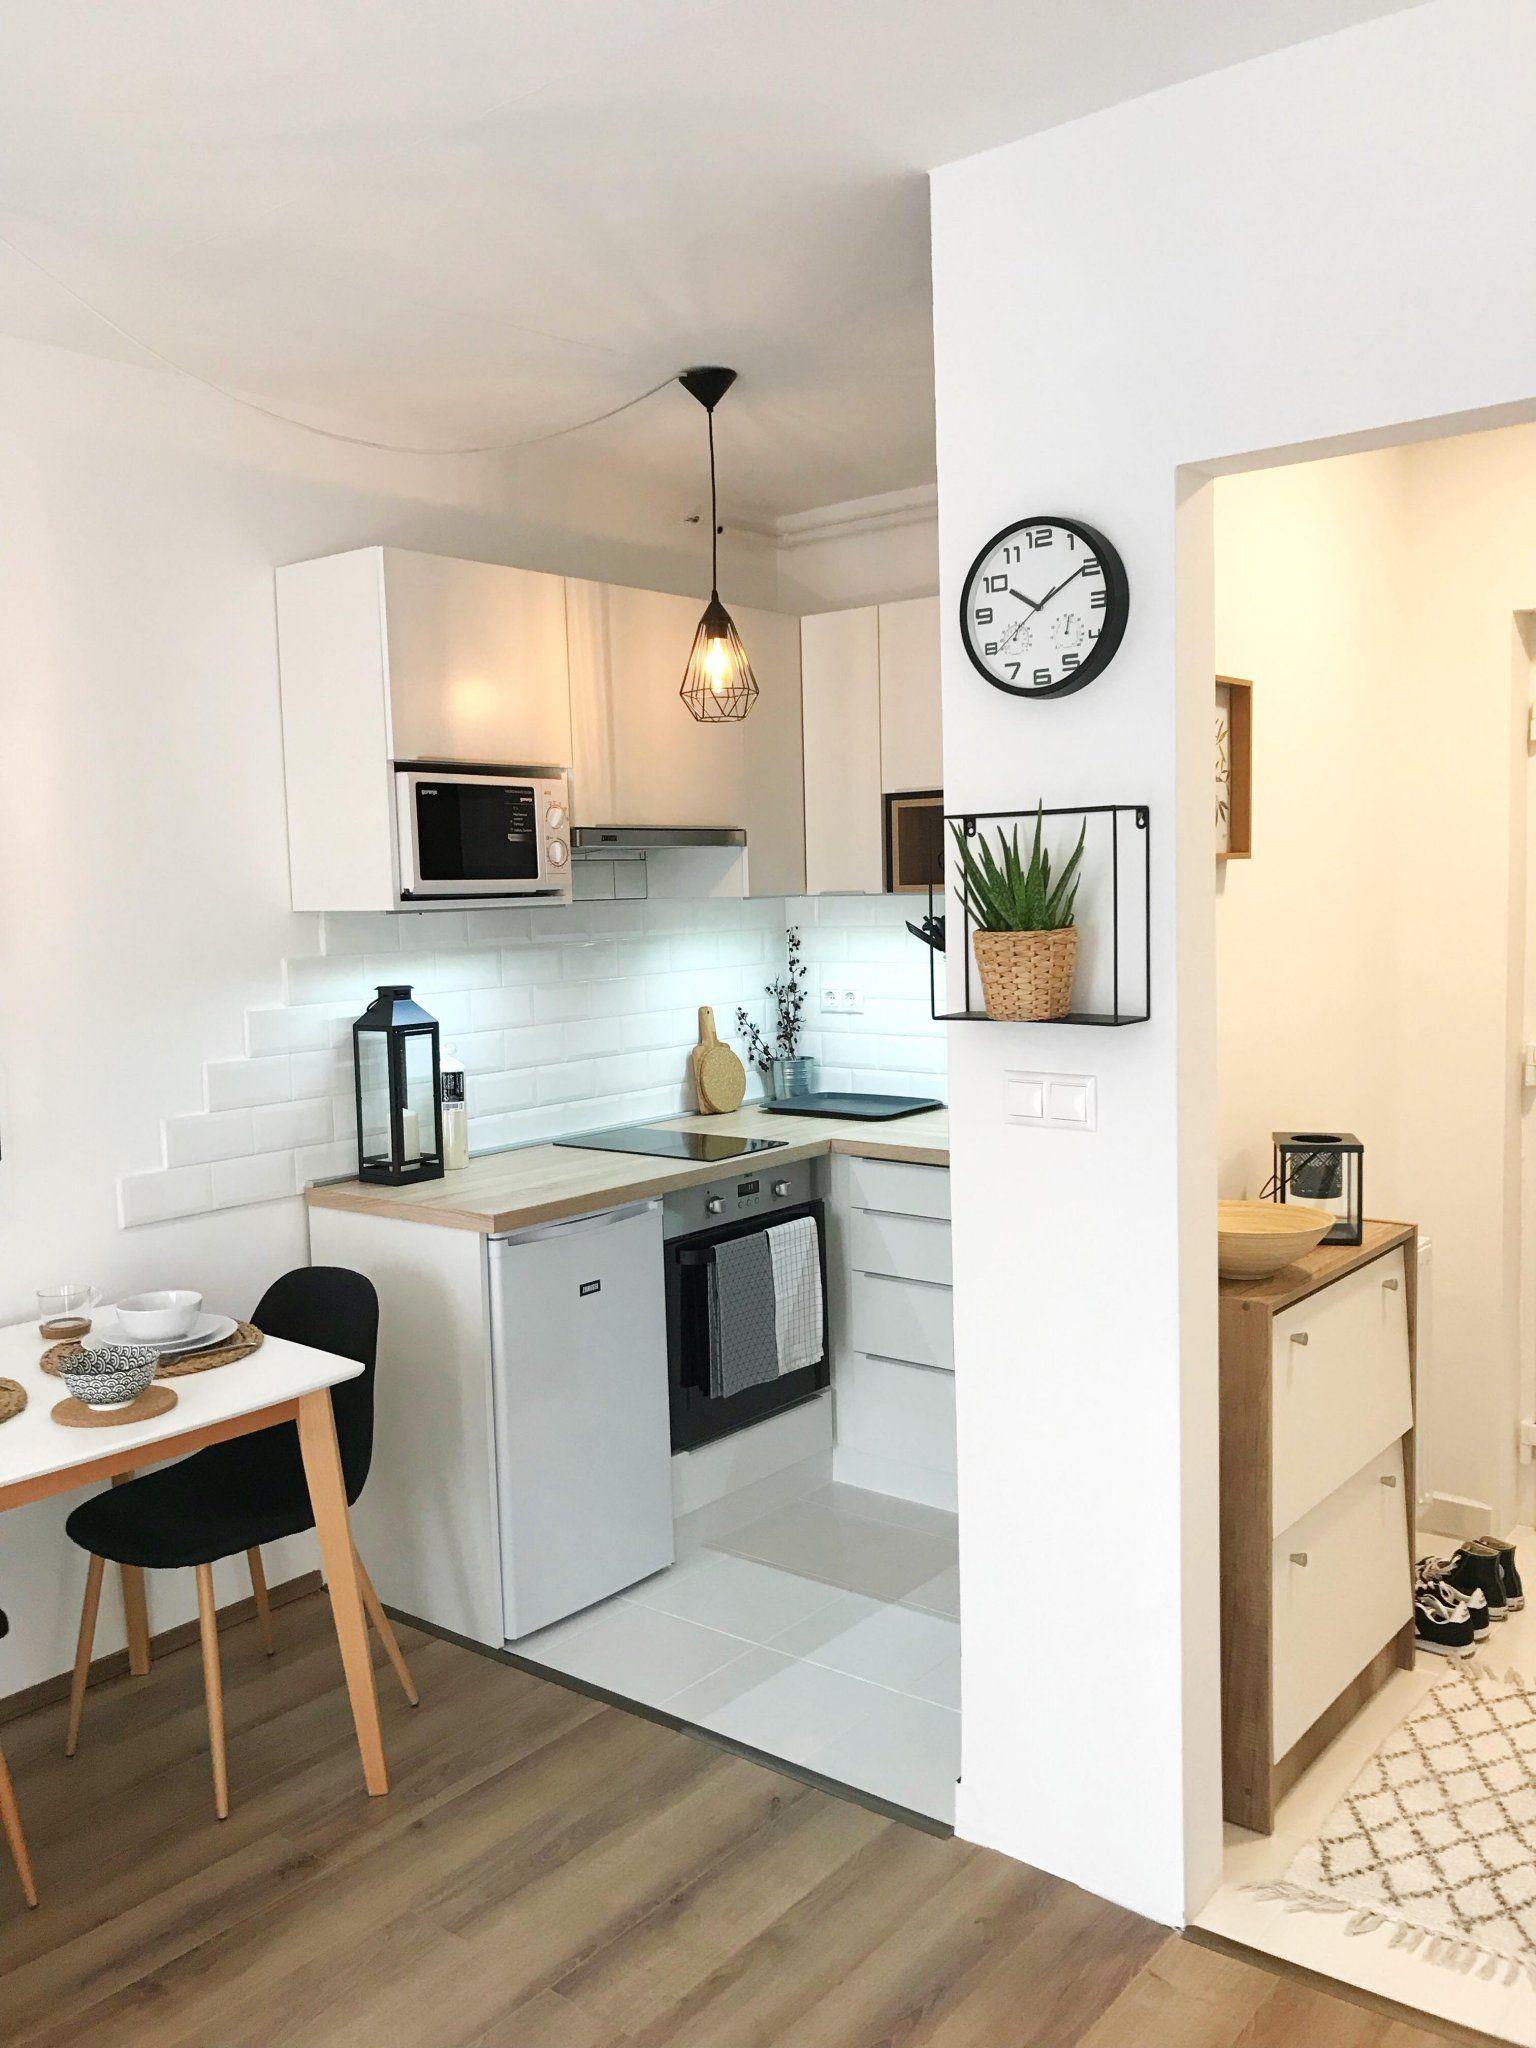 Deru Es Praktikum 30 Negyzetmeteren A Napfeny Illata Simple Kitchen Design Small Apartment Kitchen Kitchen Design Small